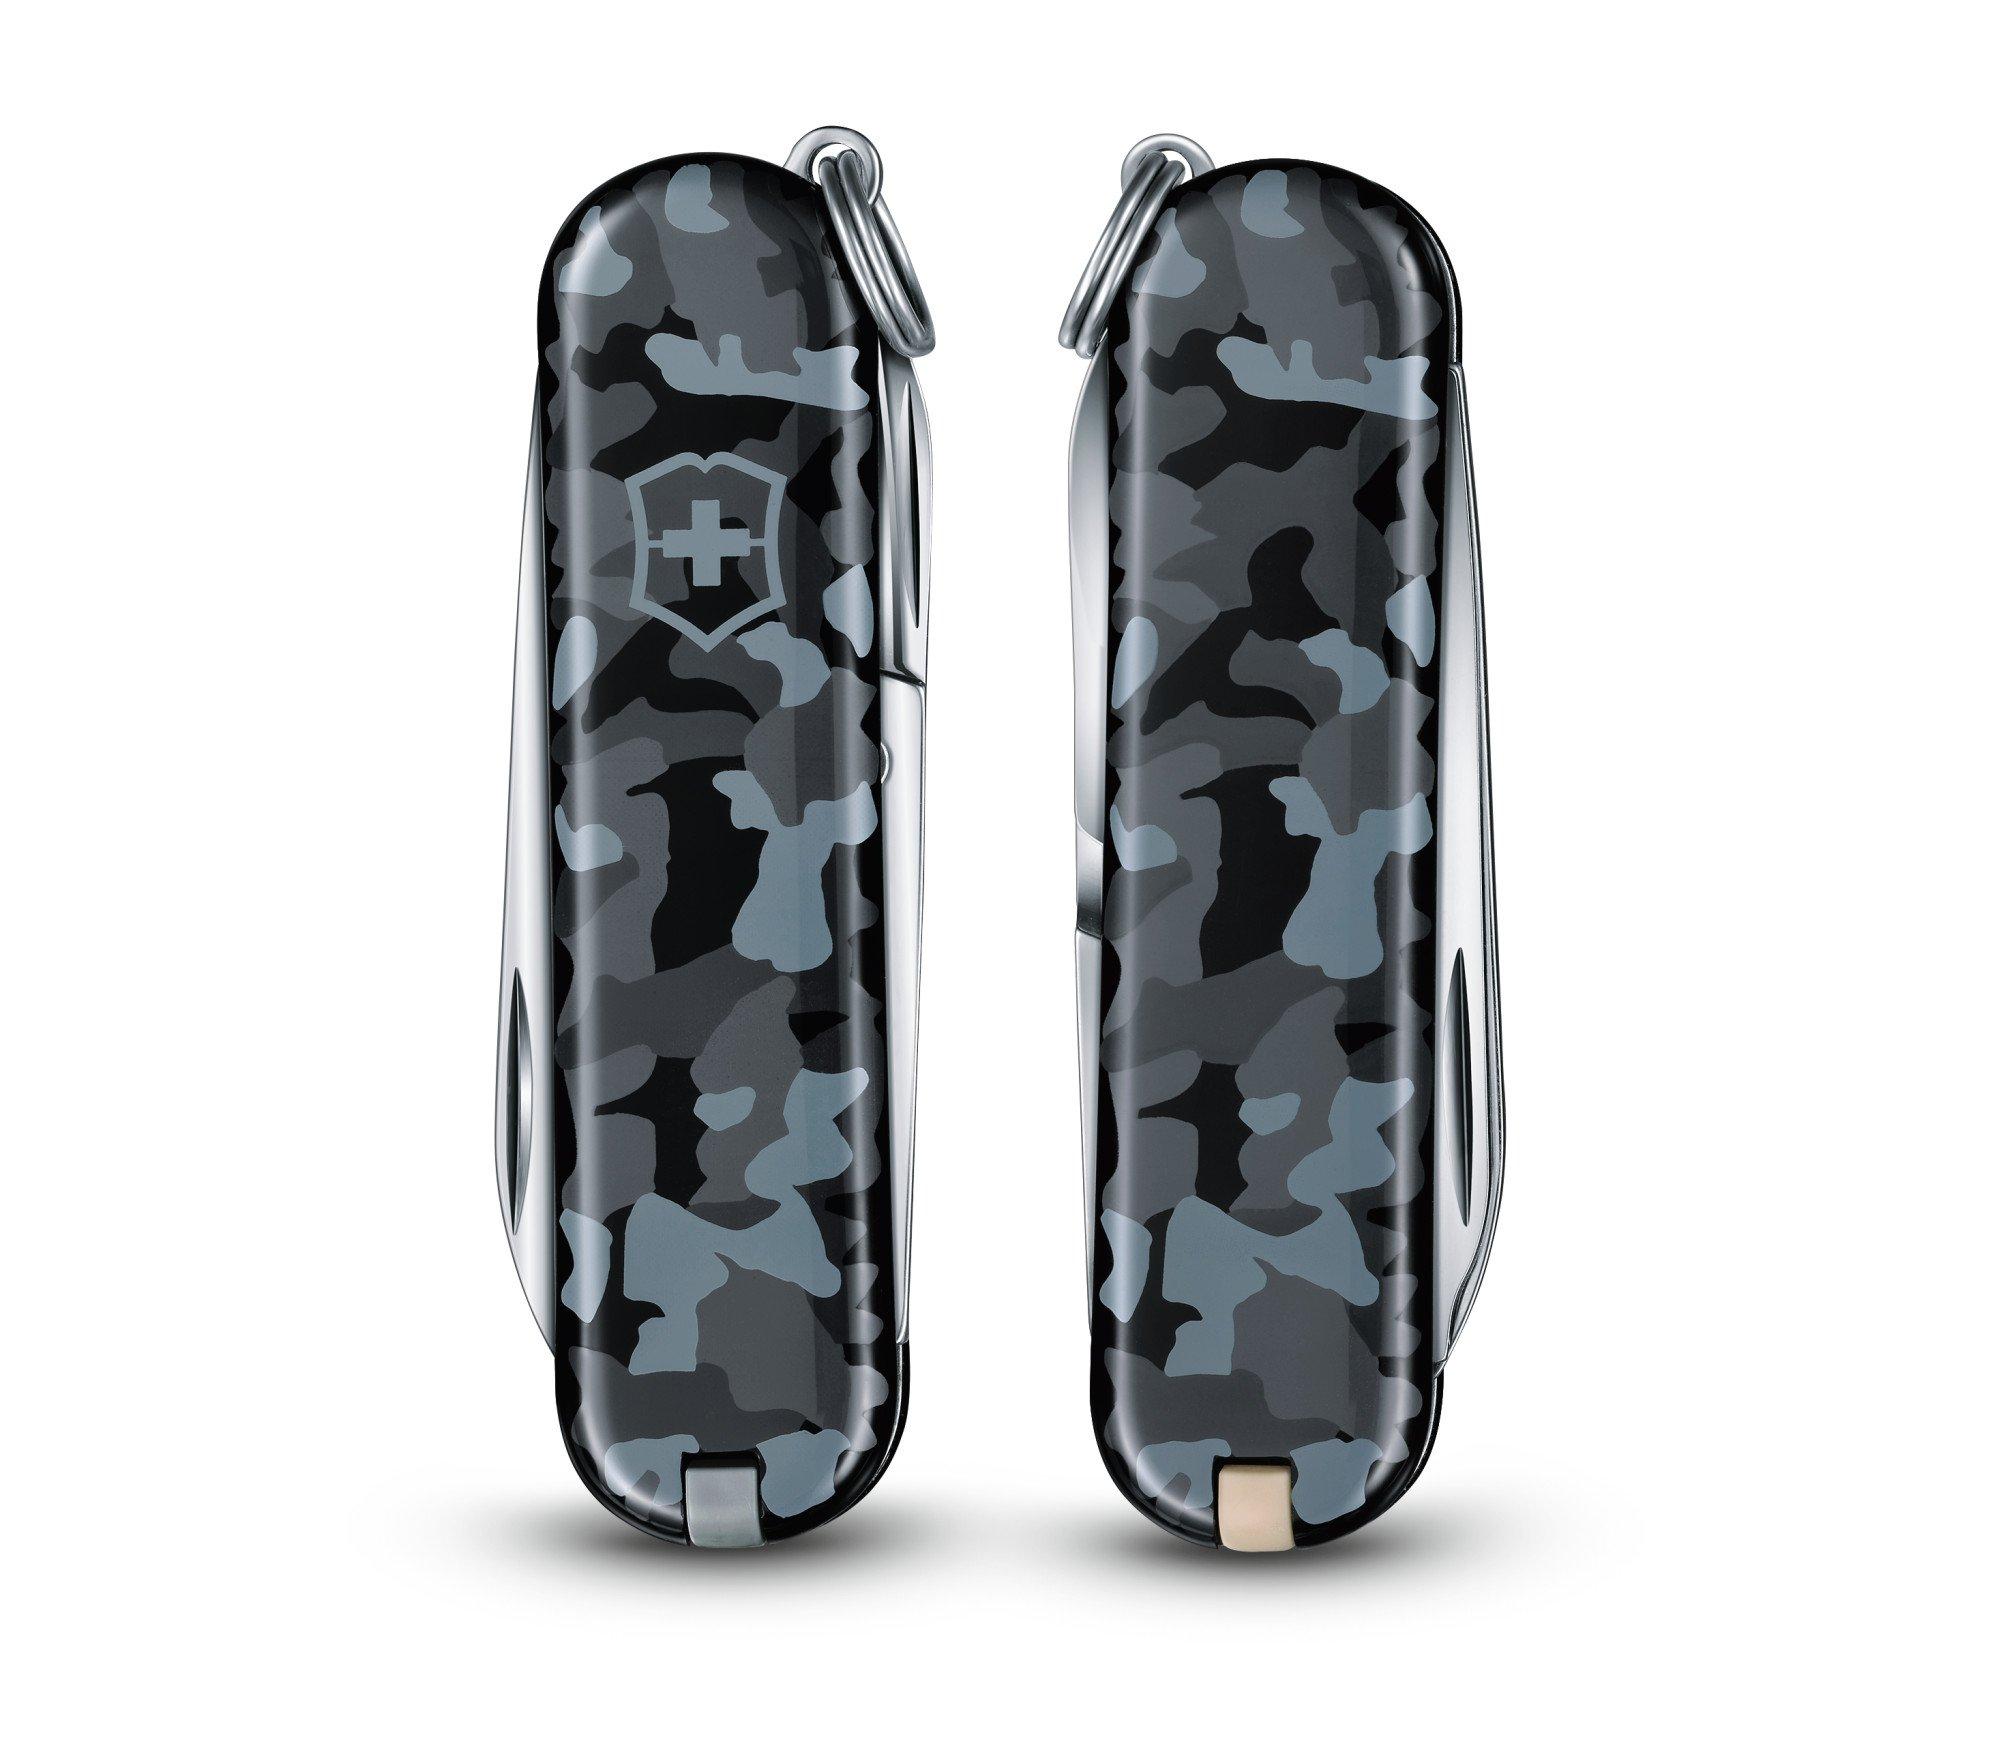 Victorinox Classic Navy Camouflage,58mm # 0.6223.942